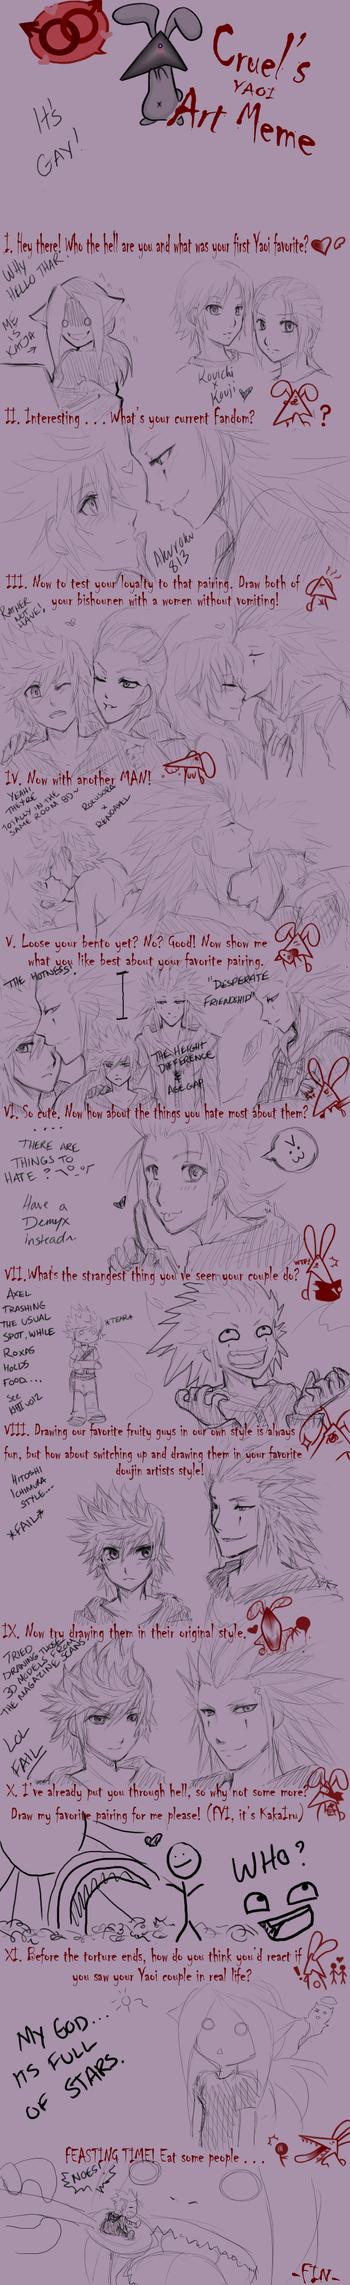 The Yaoi Meme by Memorialfire